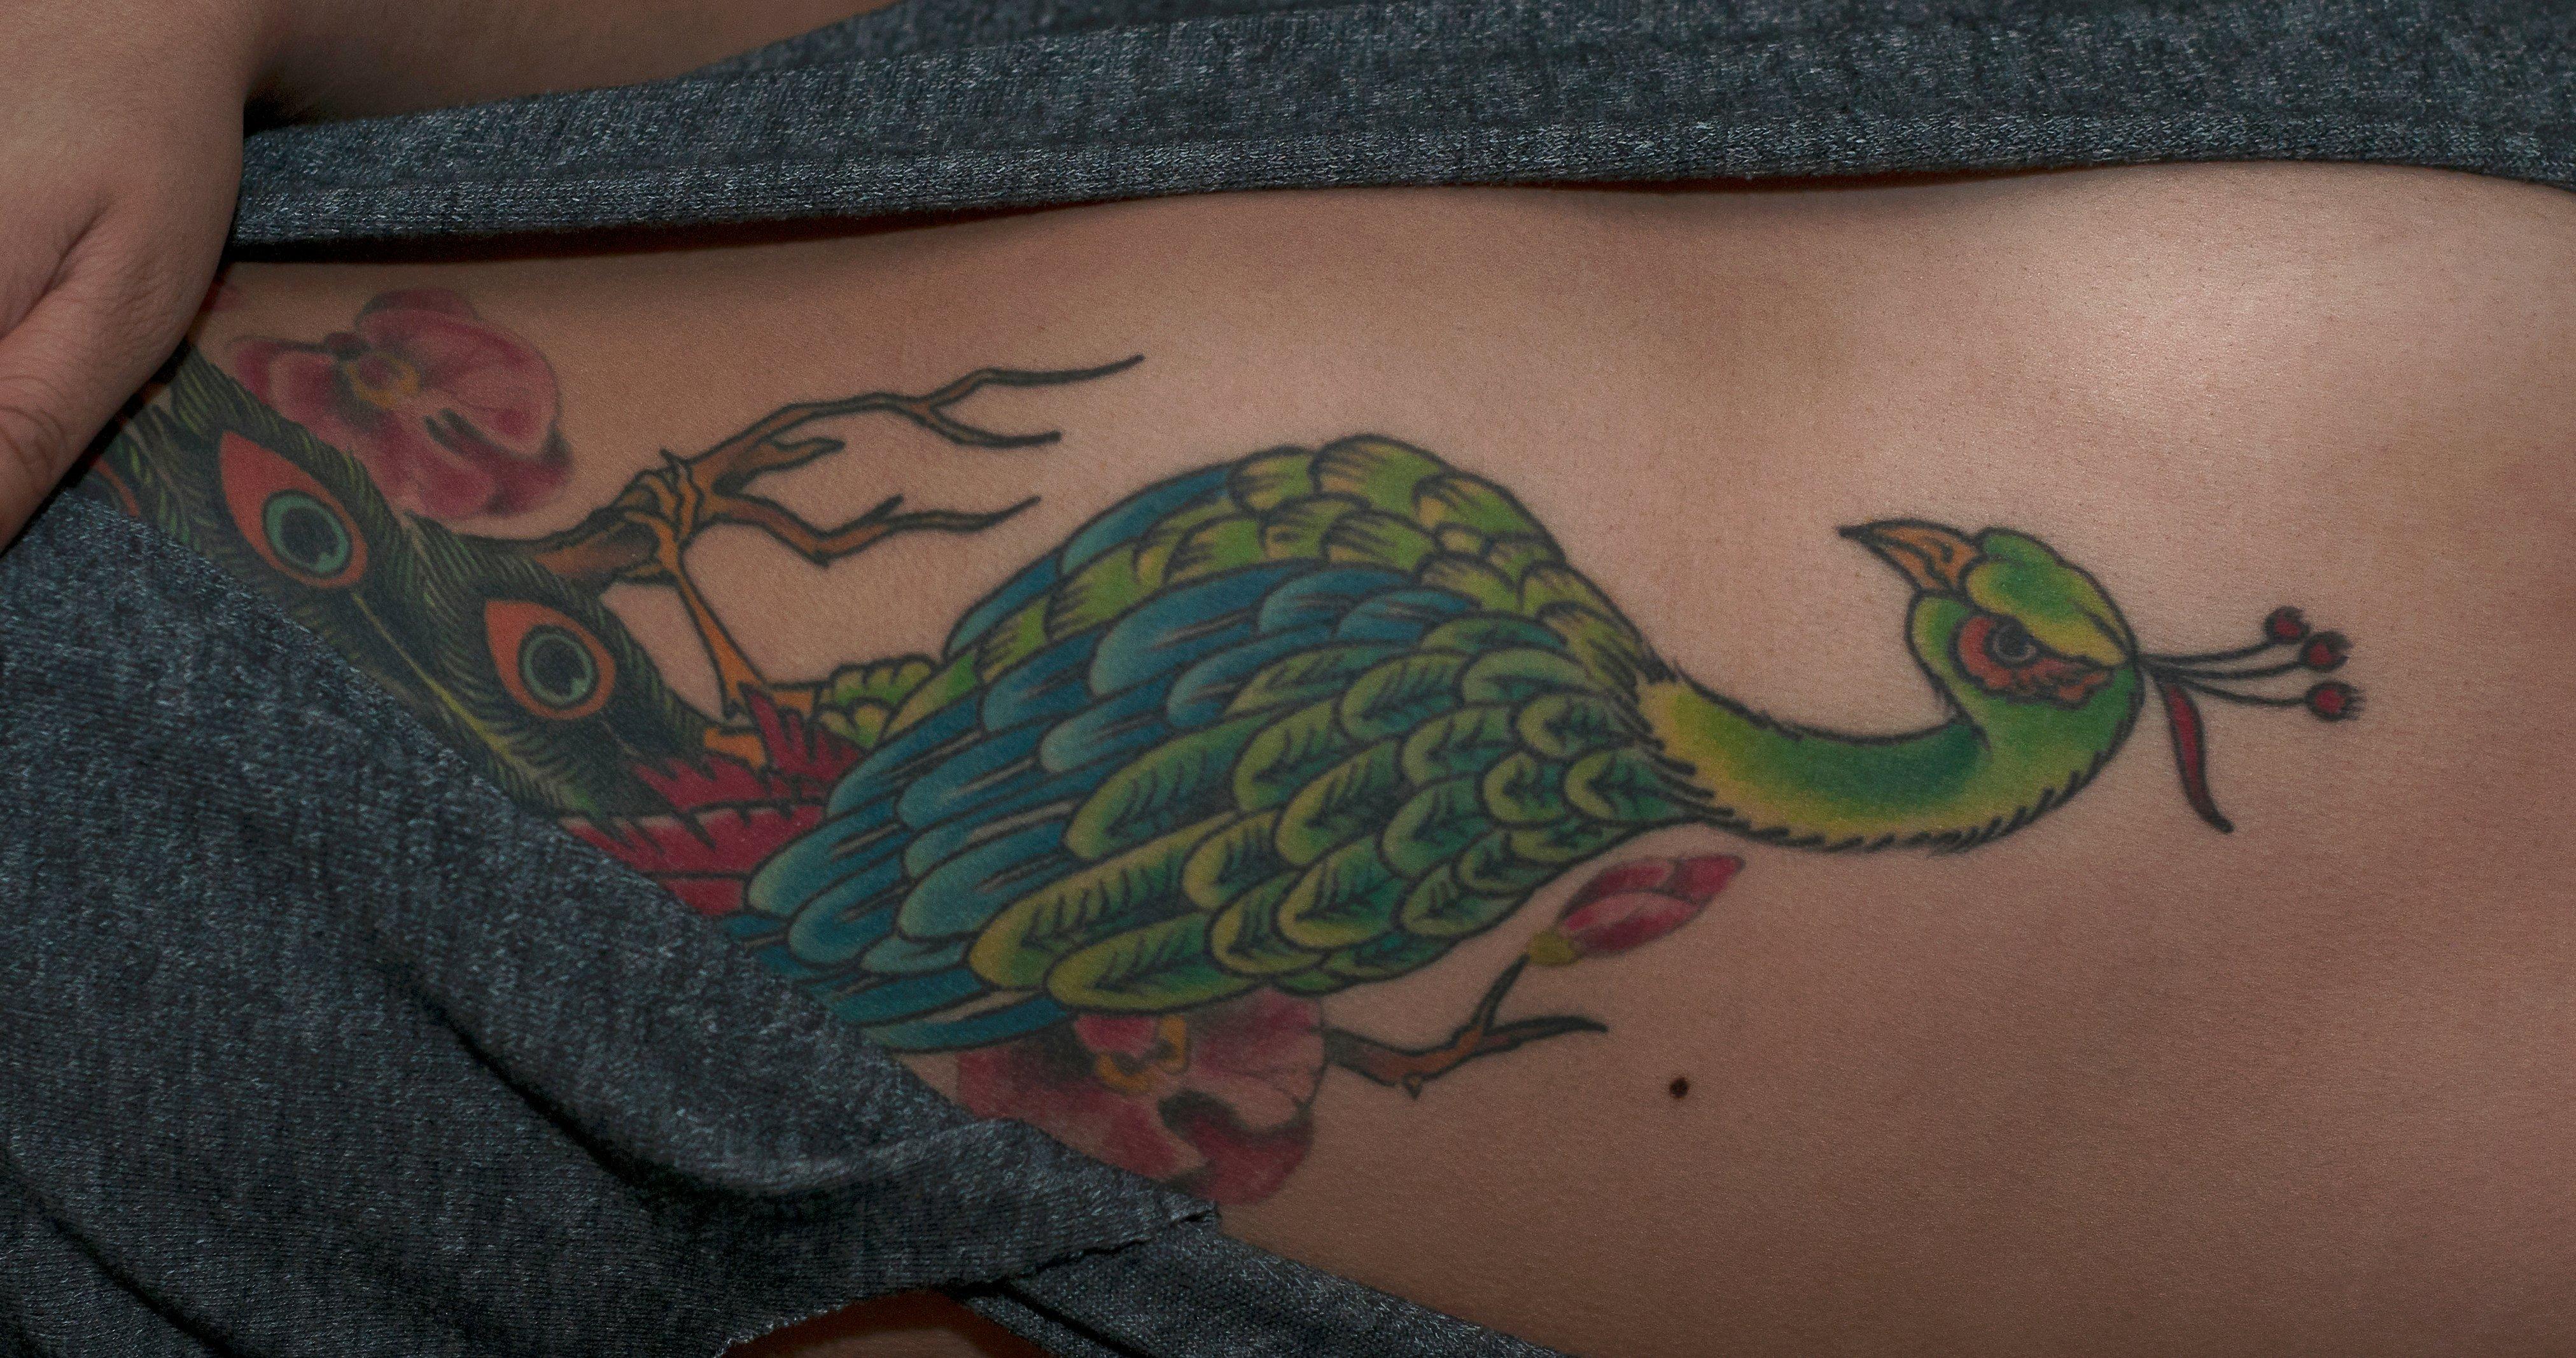 Pfau Tattoo Motive und Pfauenfeder Tattoo Bedeutung alletattoo.de 3